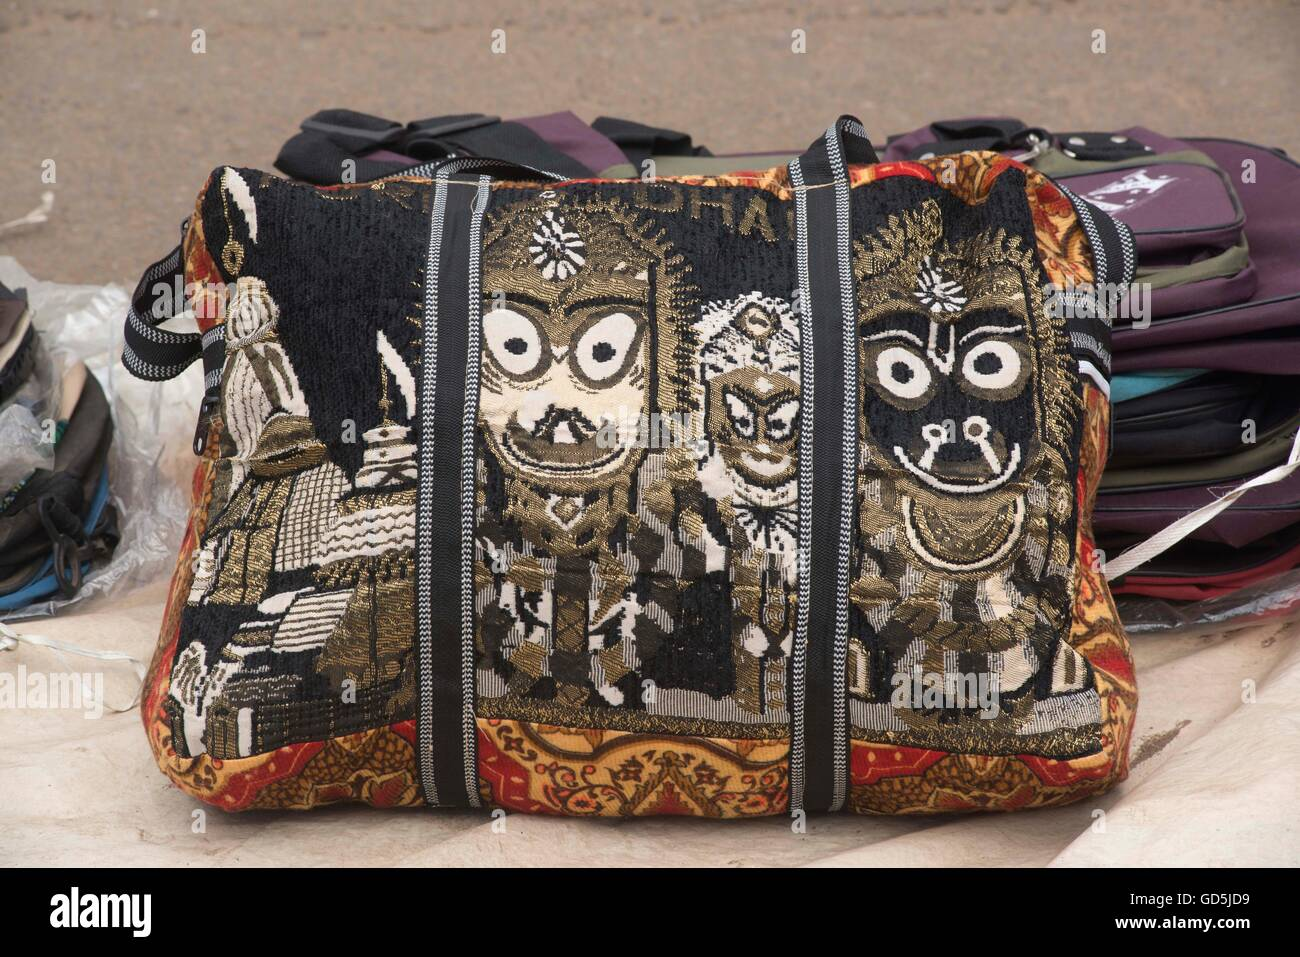 Hand bag design of deities, puri, orissa, india, asia - Stock Image